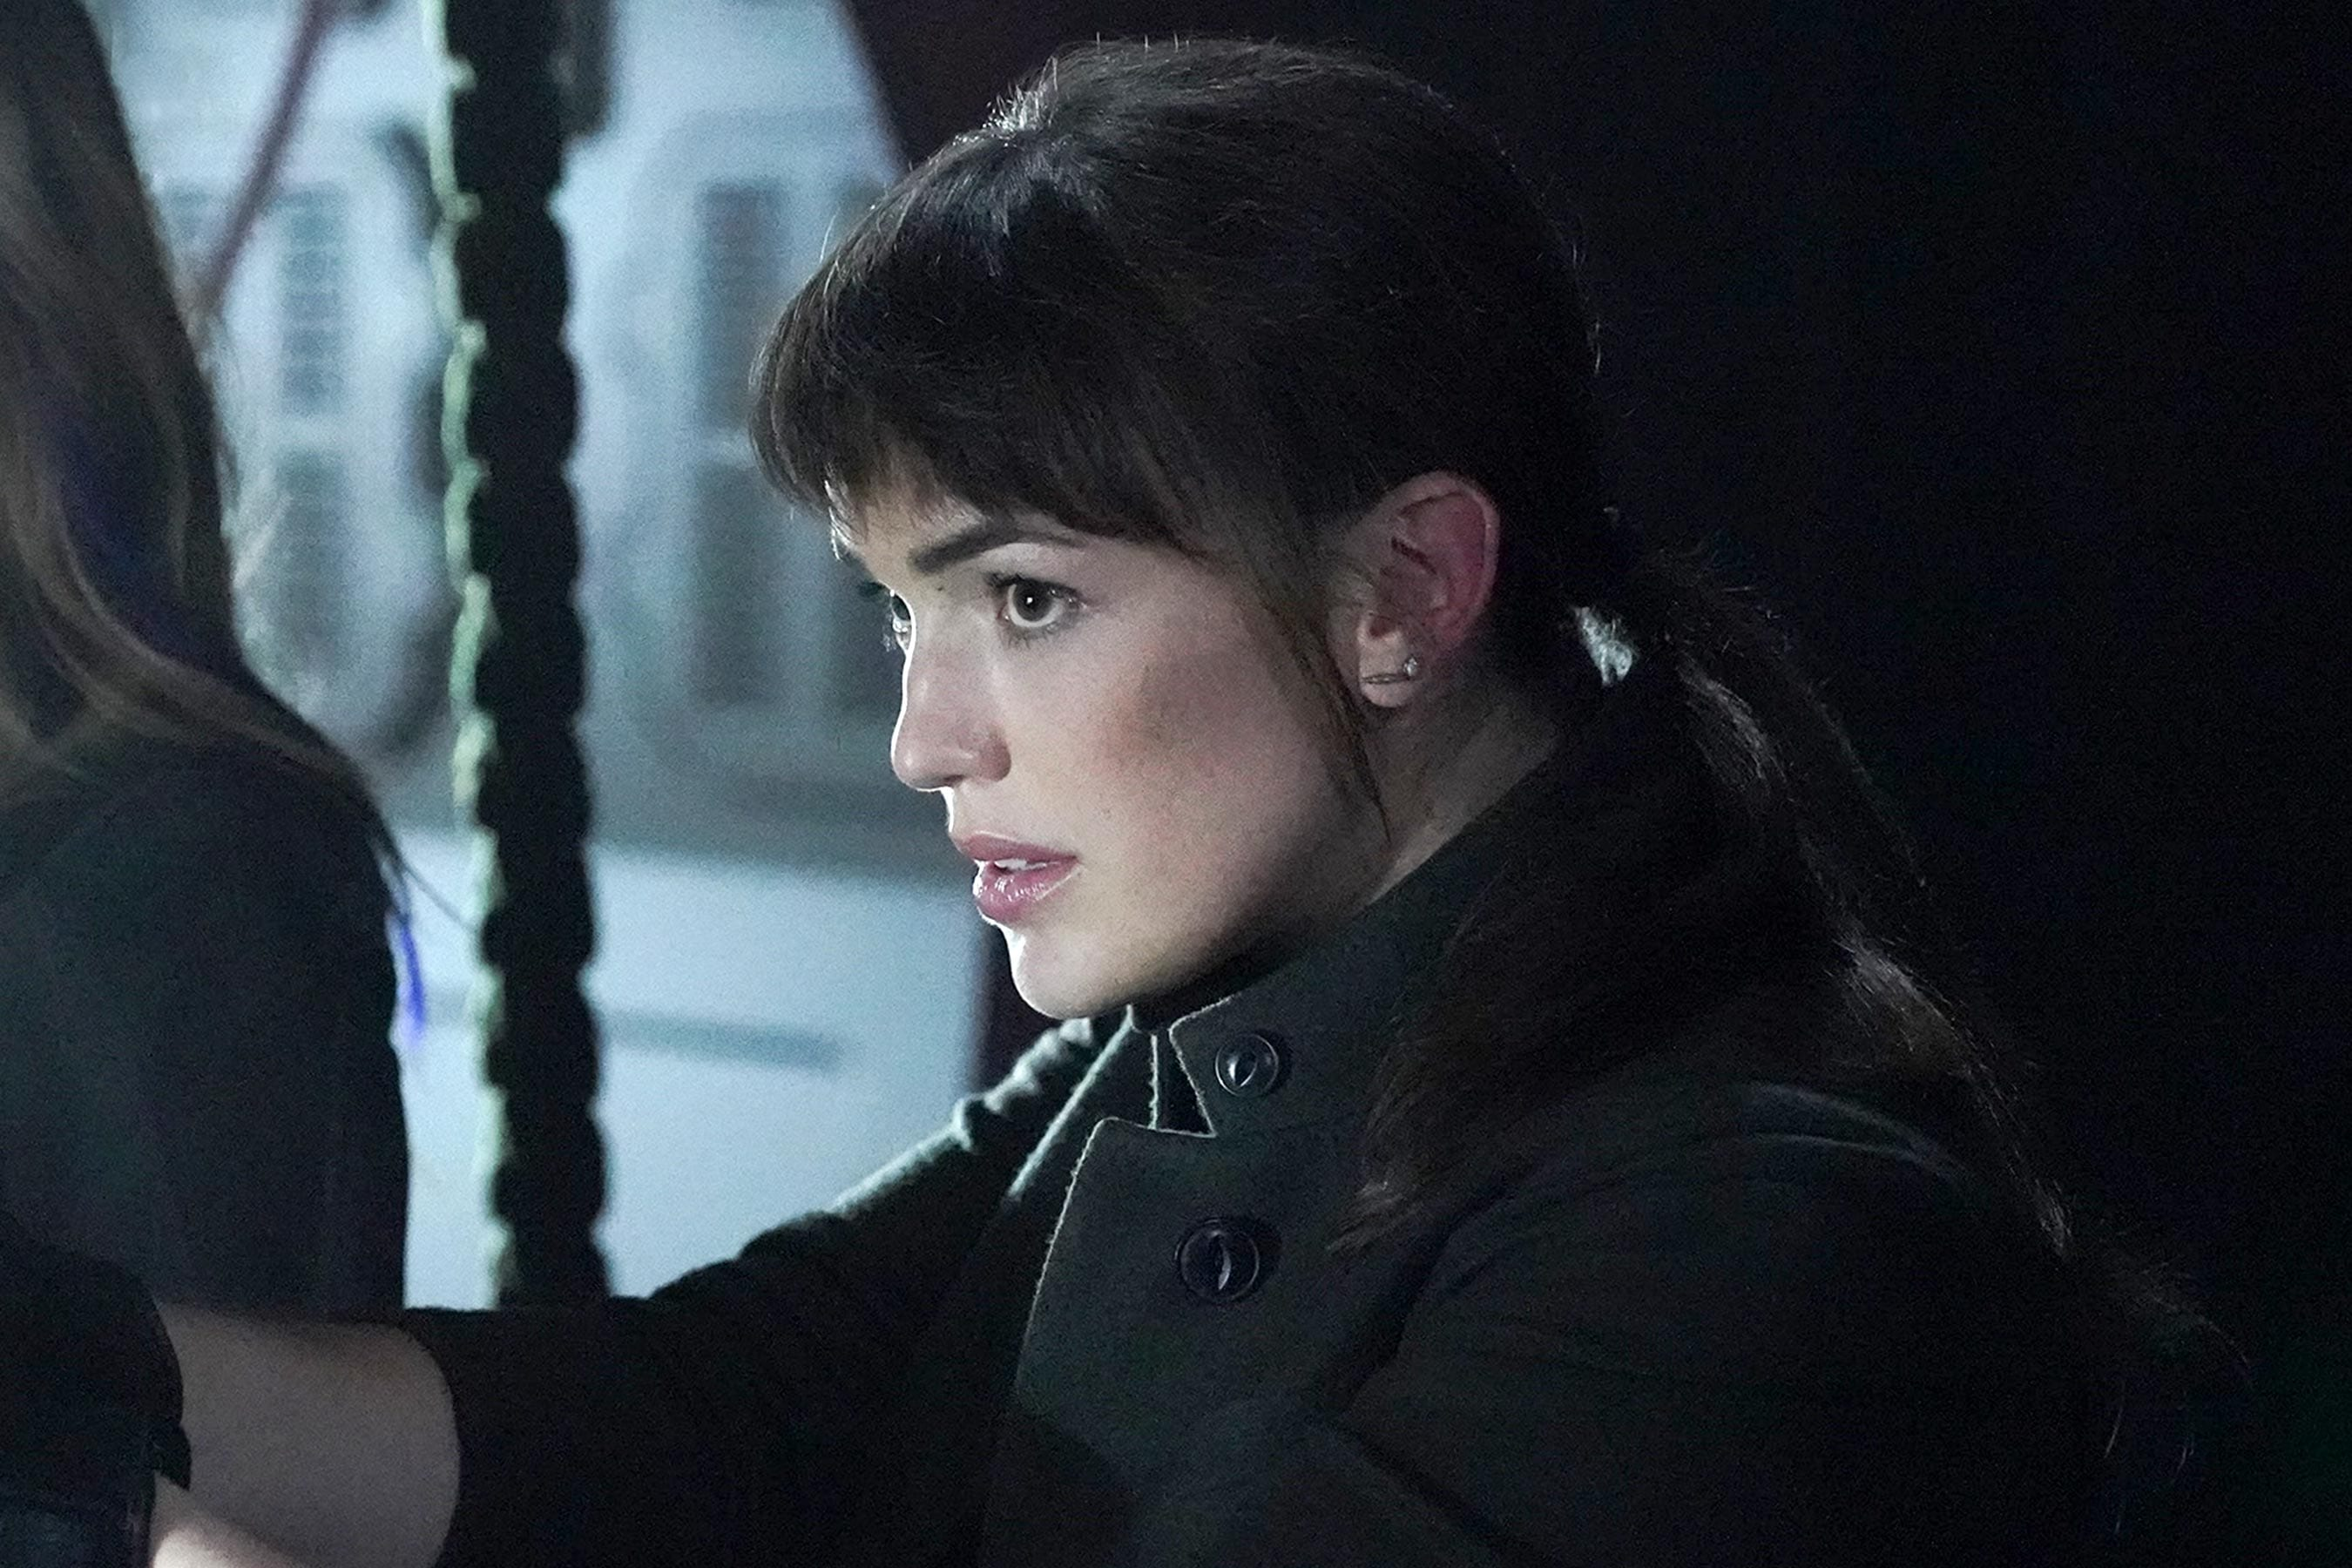 Agents of SHIELD Season 6 Episode 7